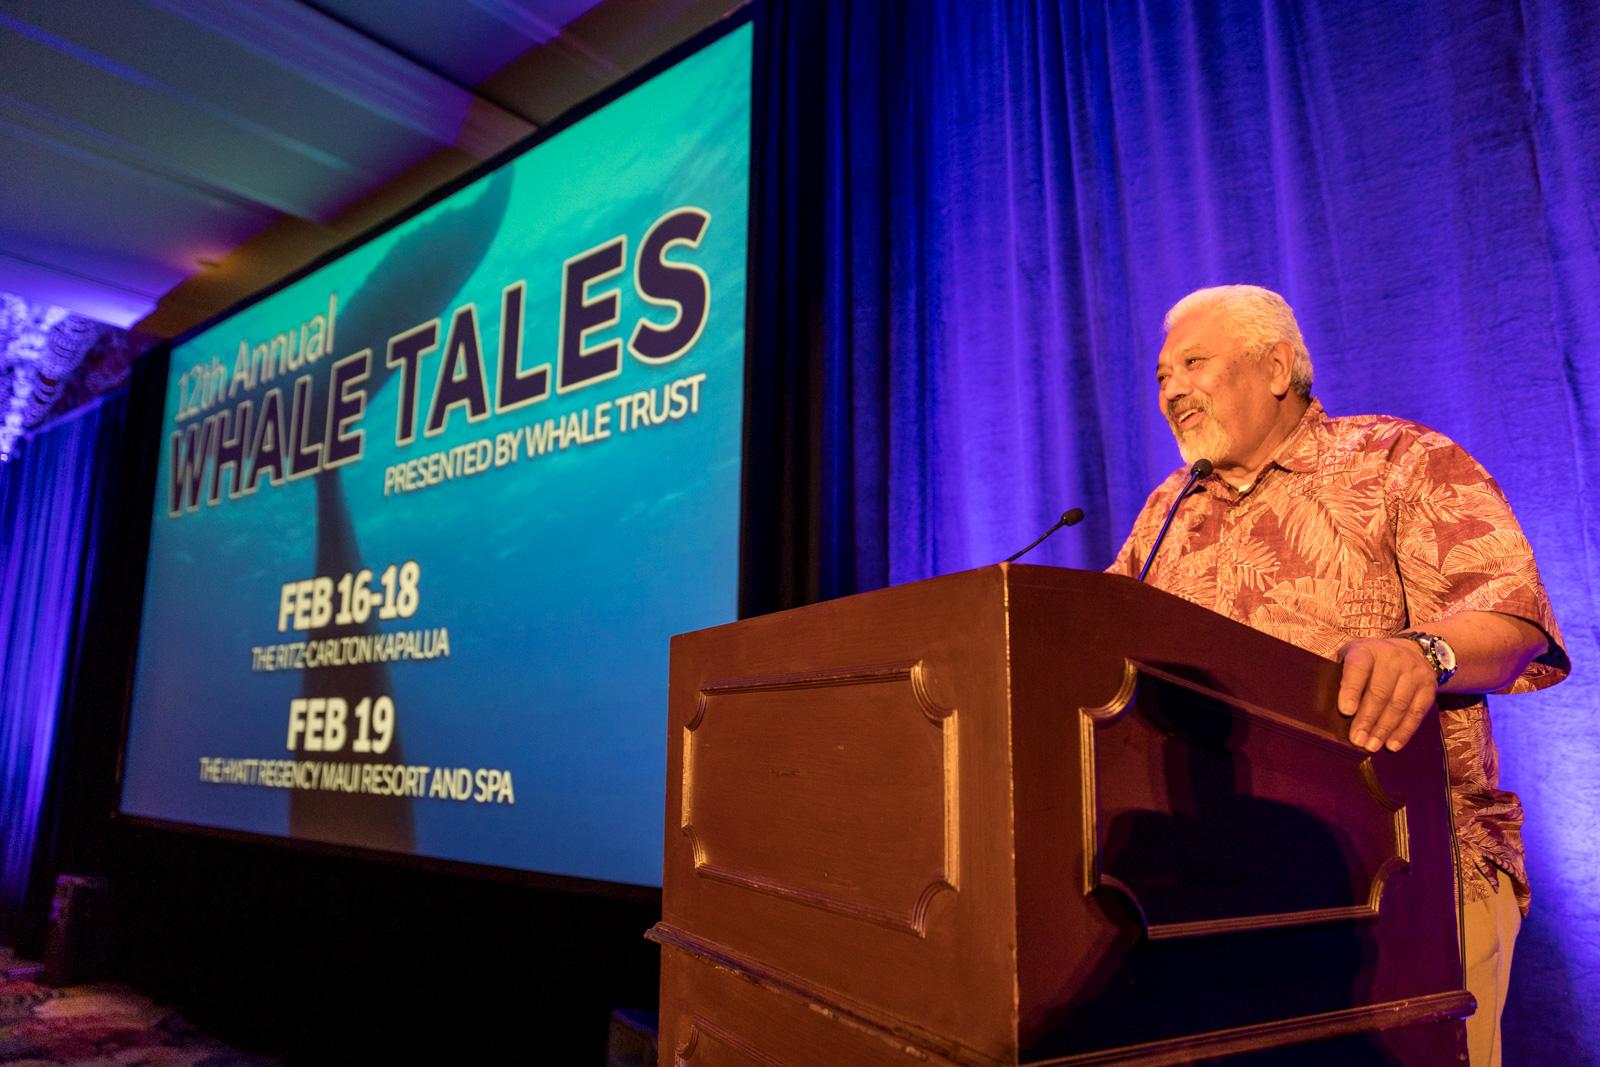 WhaleTales_2018-954_web_berkowitz